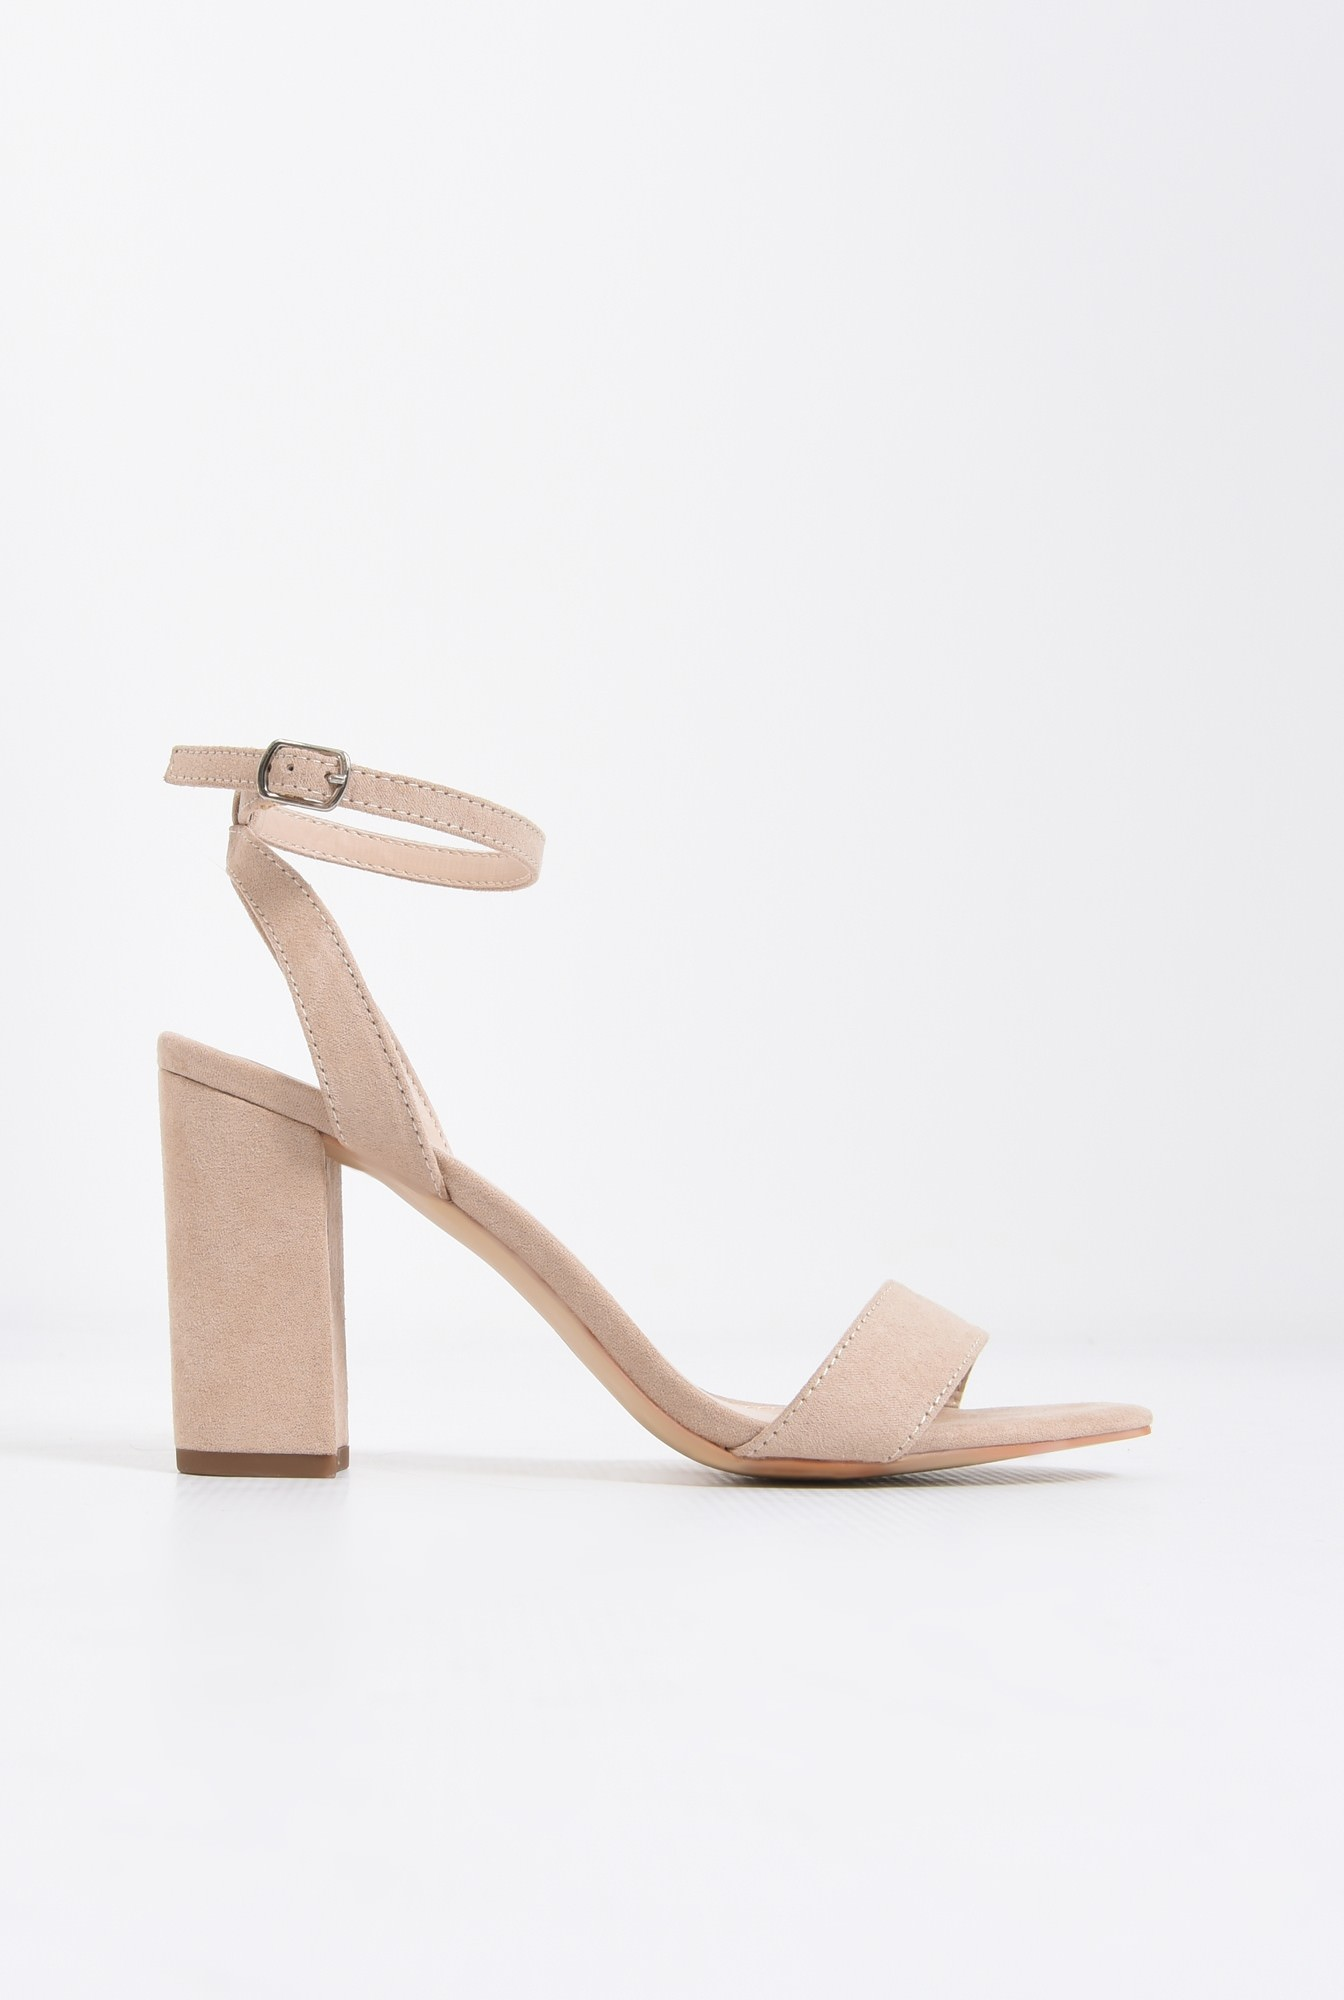 0 - sandale elegante, crem, toc gros, piele intoarsa eco